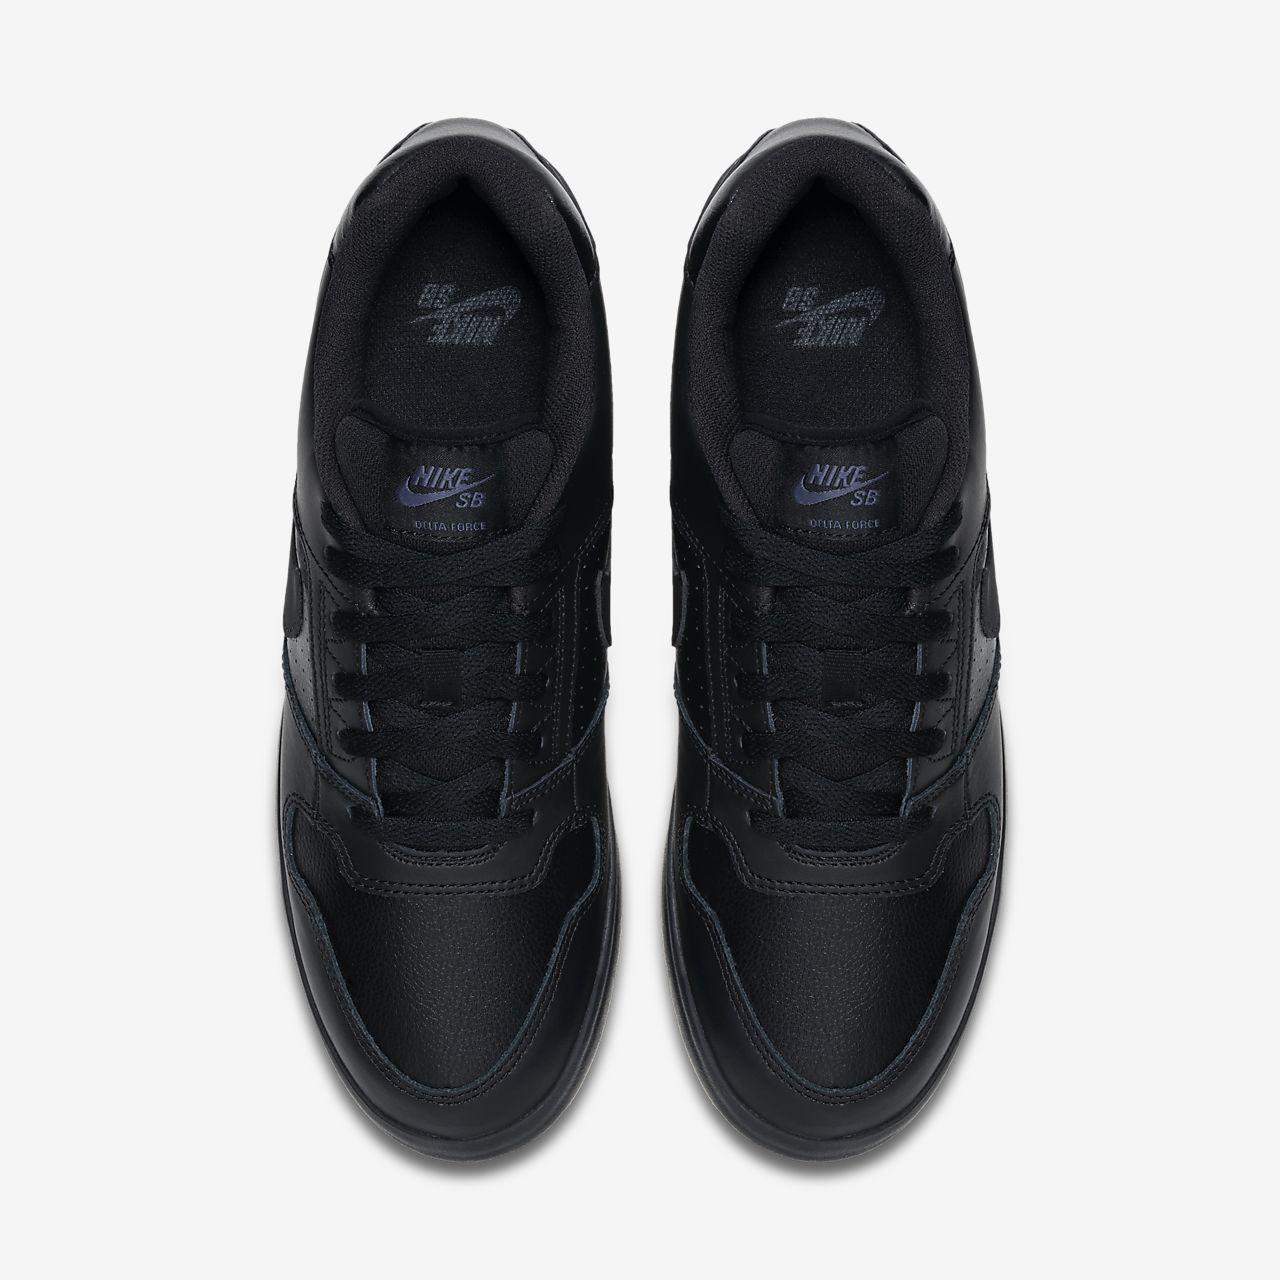 Sapatilhas de skateboard Nike SB Delta Force Vulc para homem